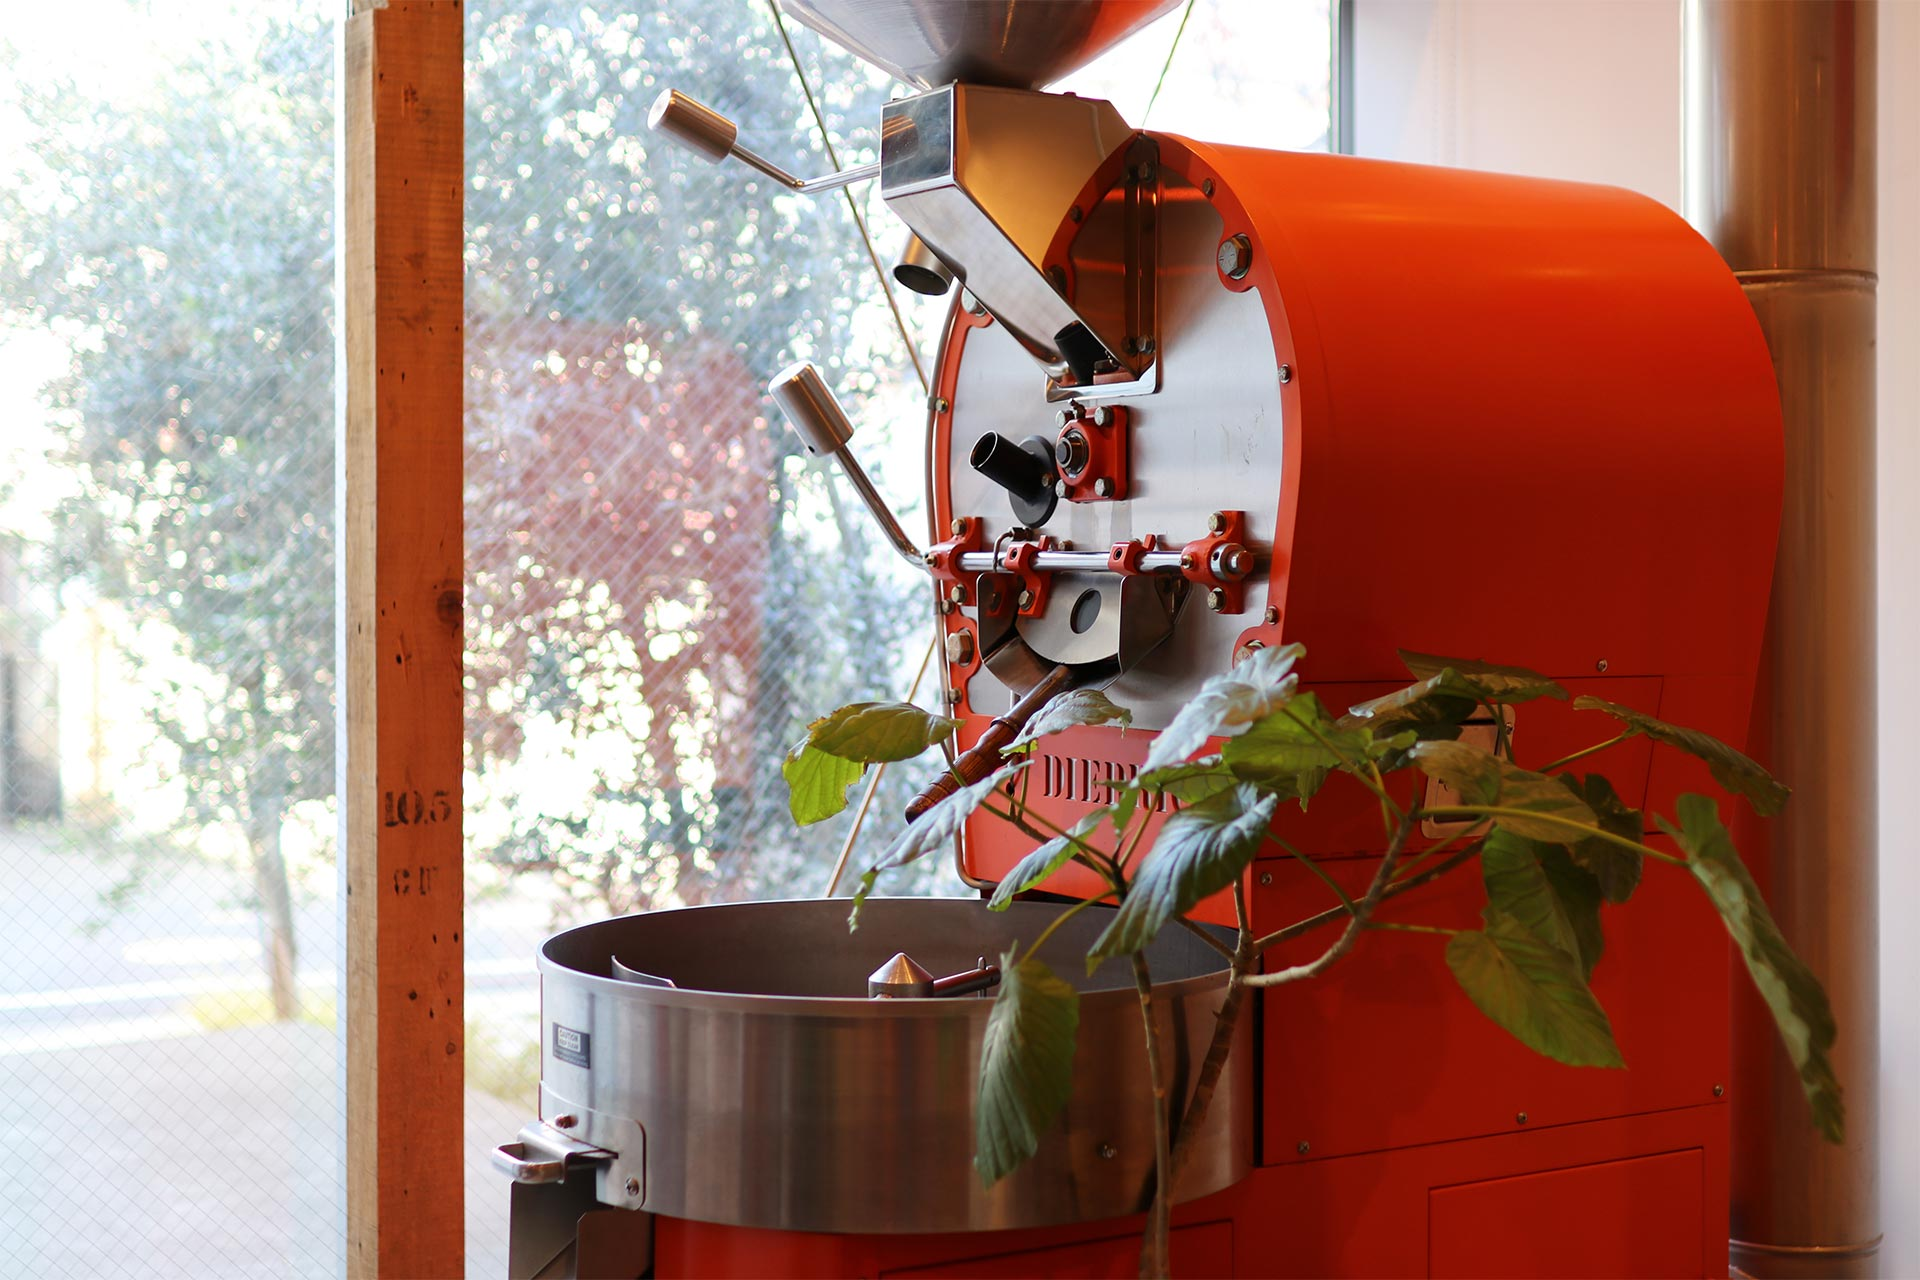 FINETIME COFFEE ROASTERSの焙煎機ディードリッヒ